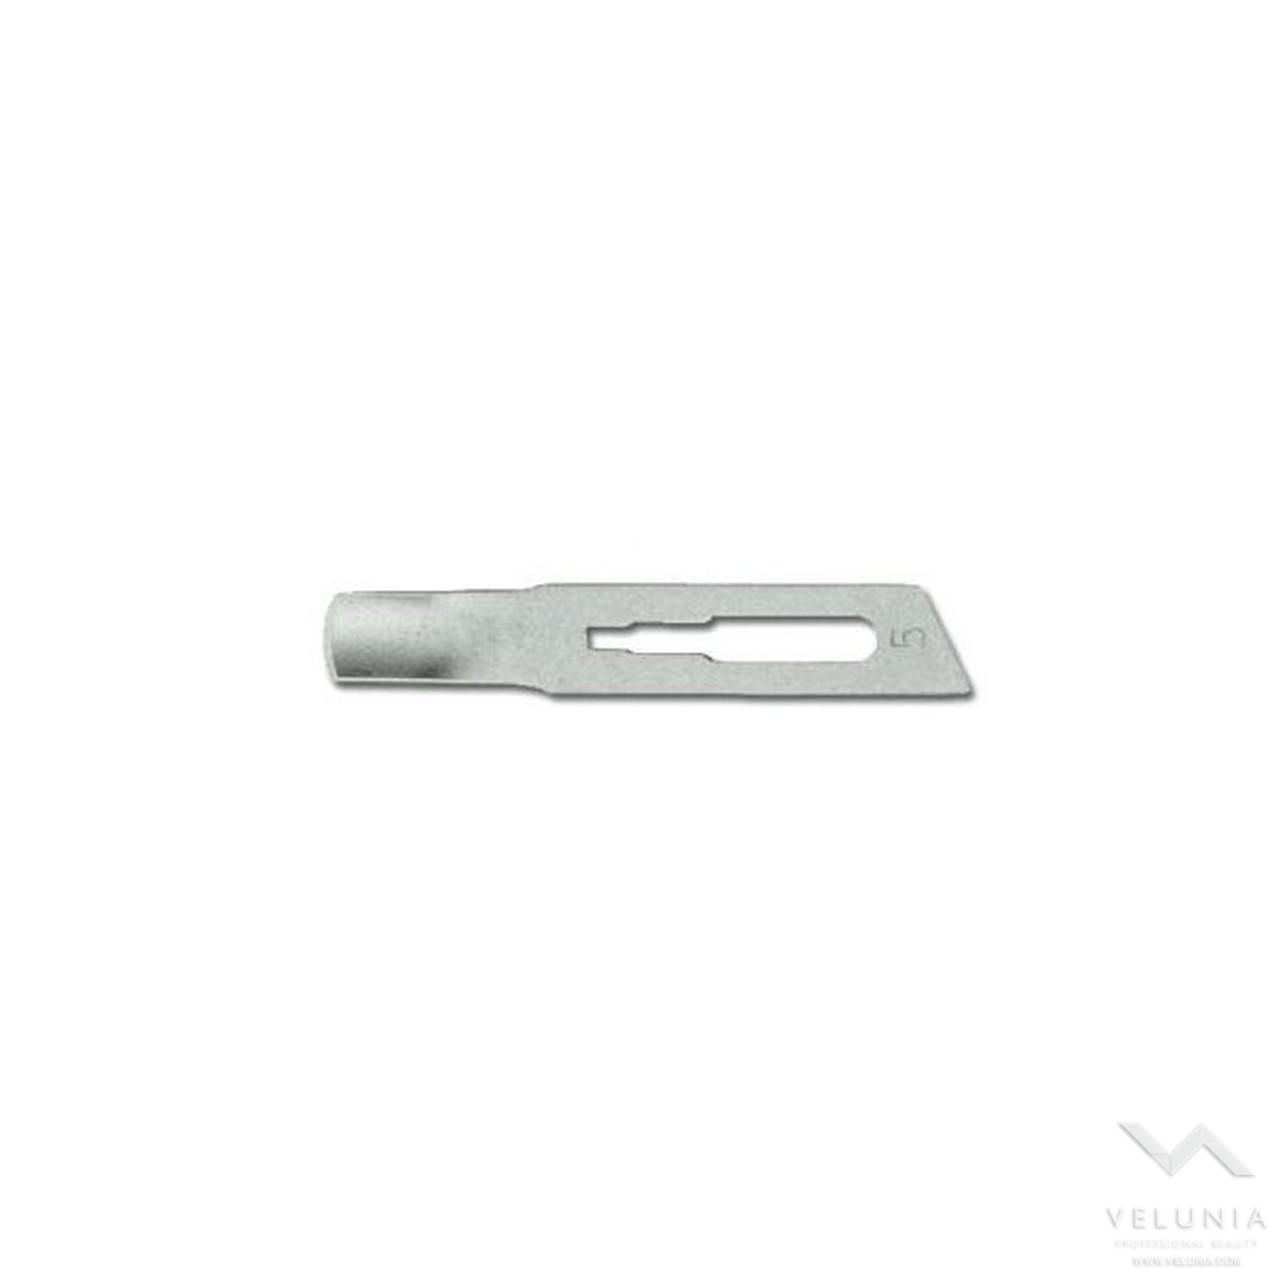 Lame Sgorbie  Sterili Inox - misura 5 mm - Scatola 12 pz. 1